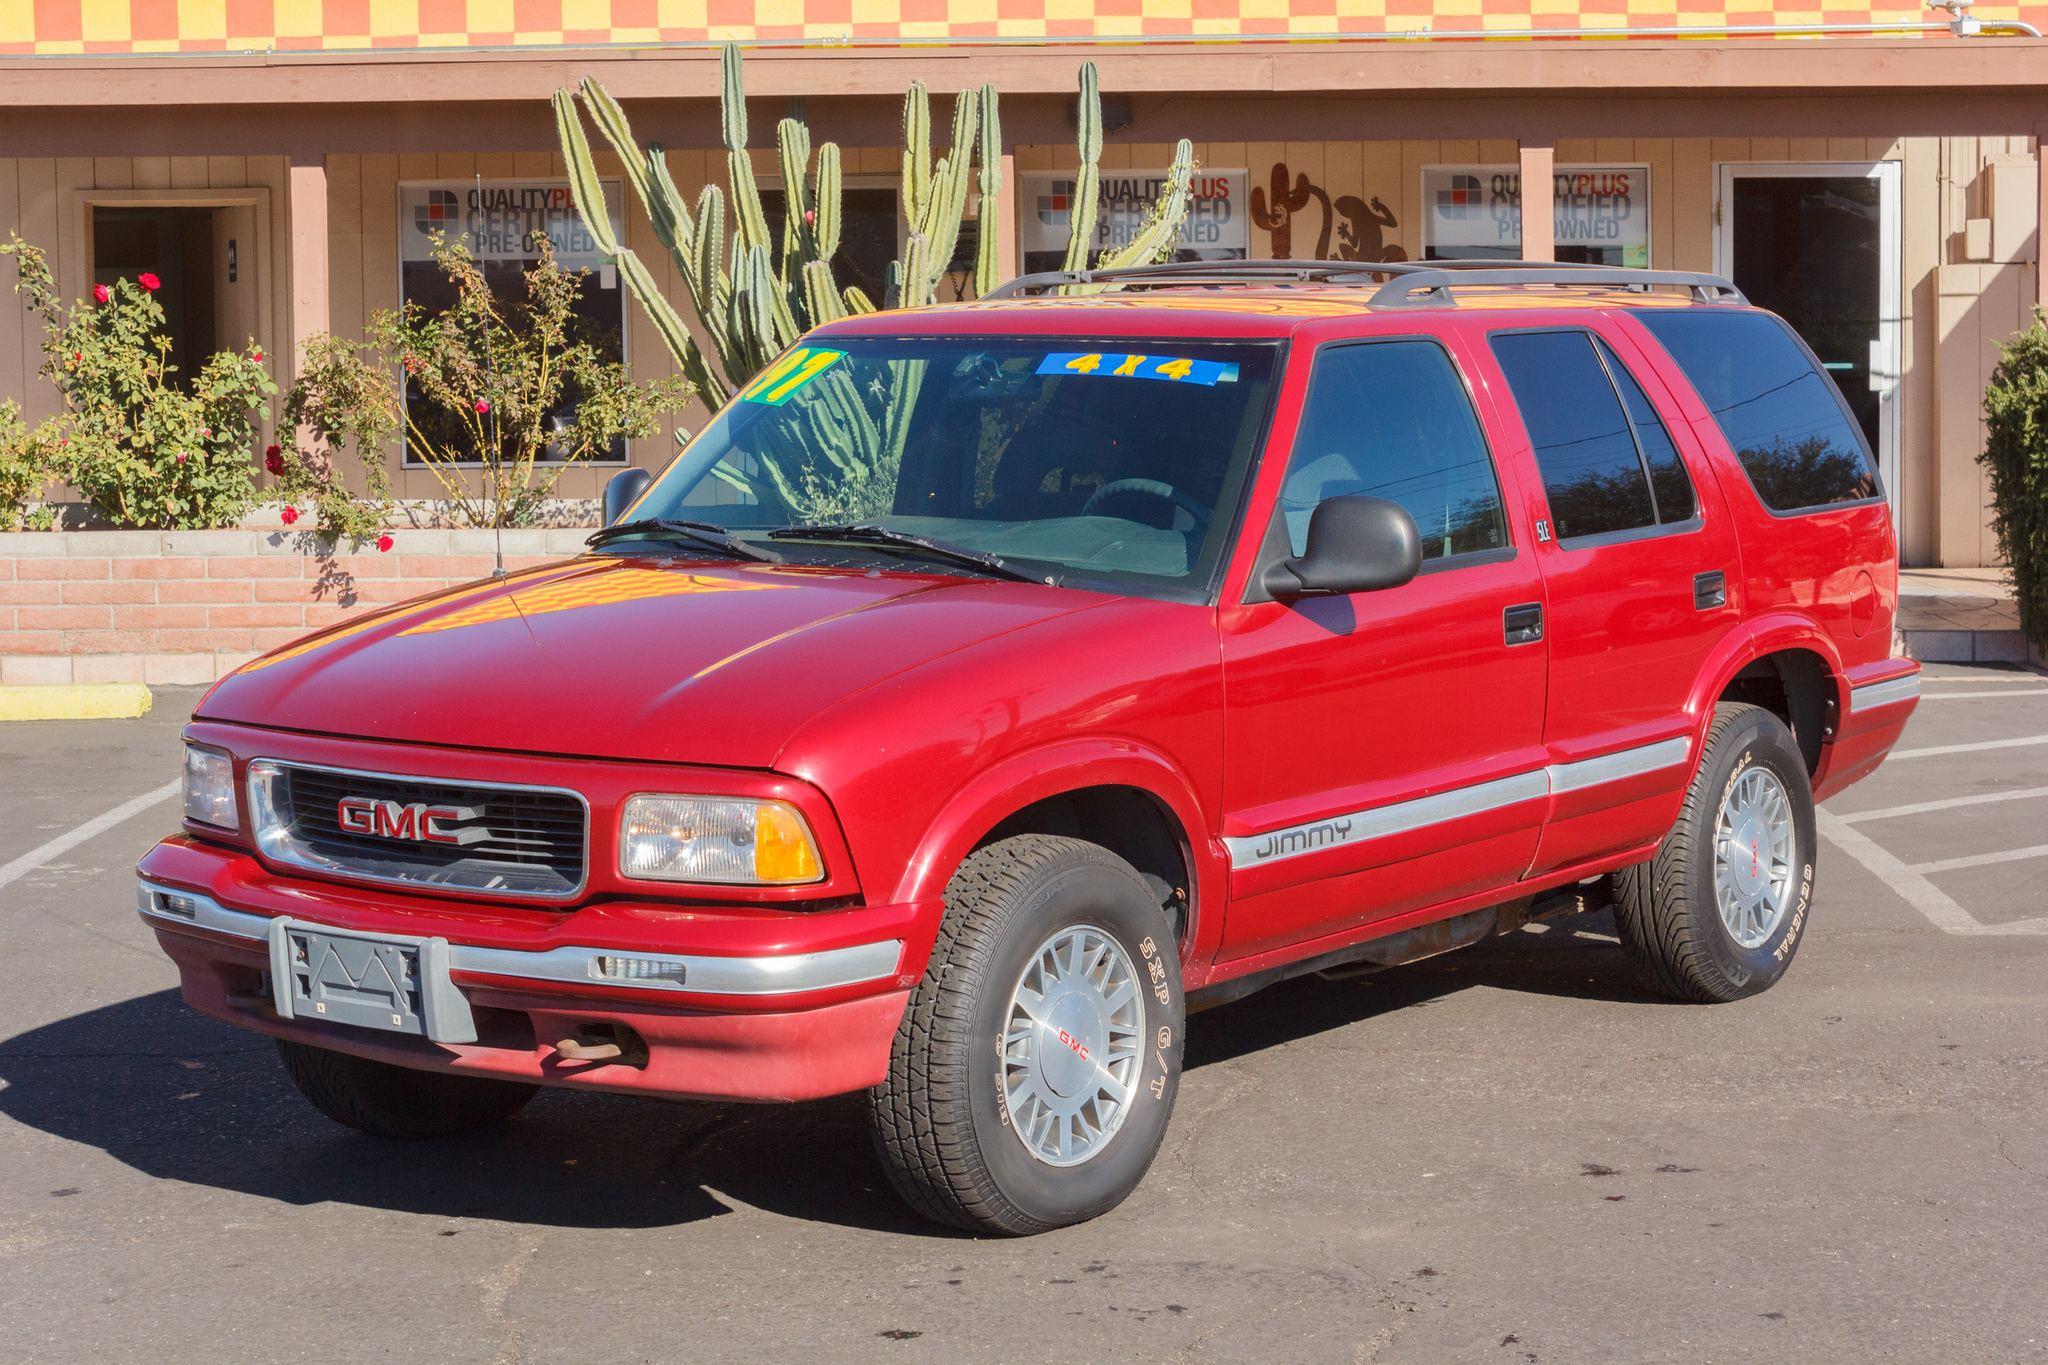 Photo of 1997 GMC Jimmy 4WD 4d Wagon SLE Cherry Red Metallic